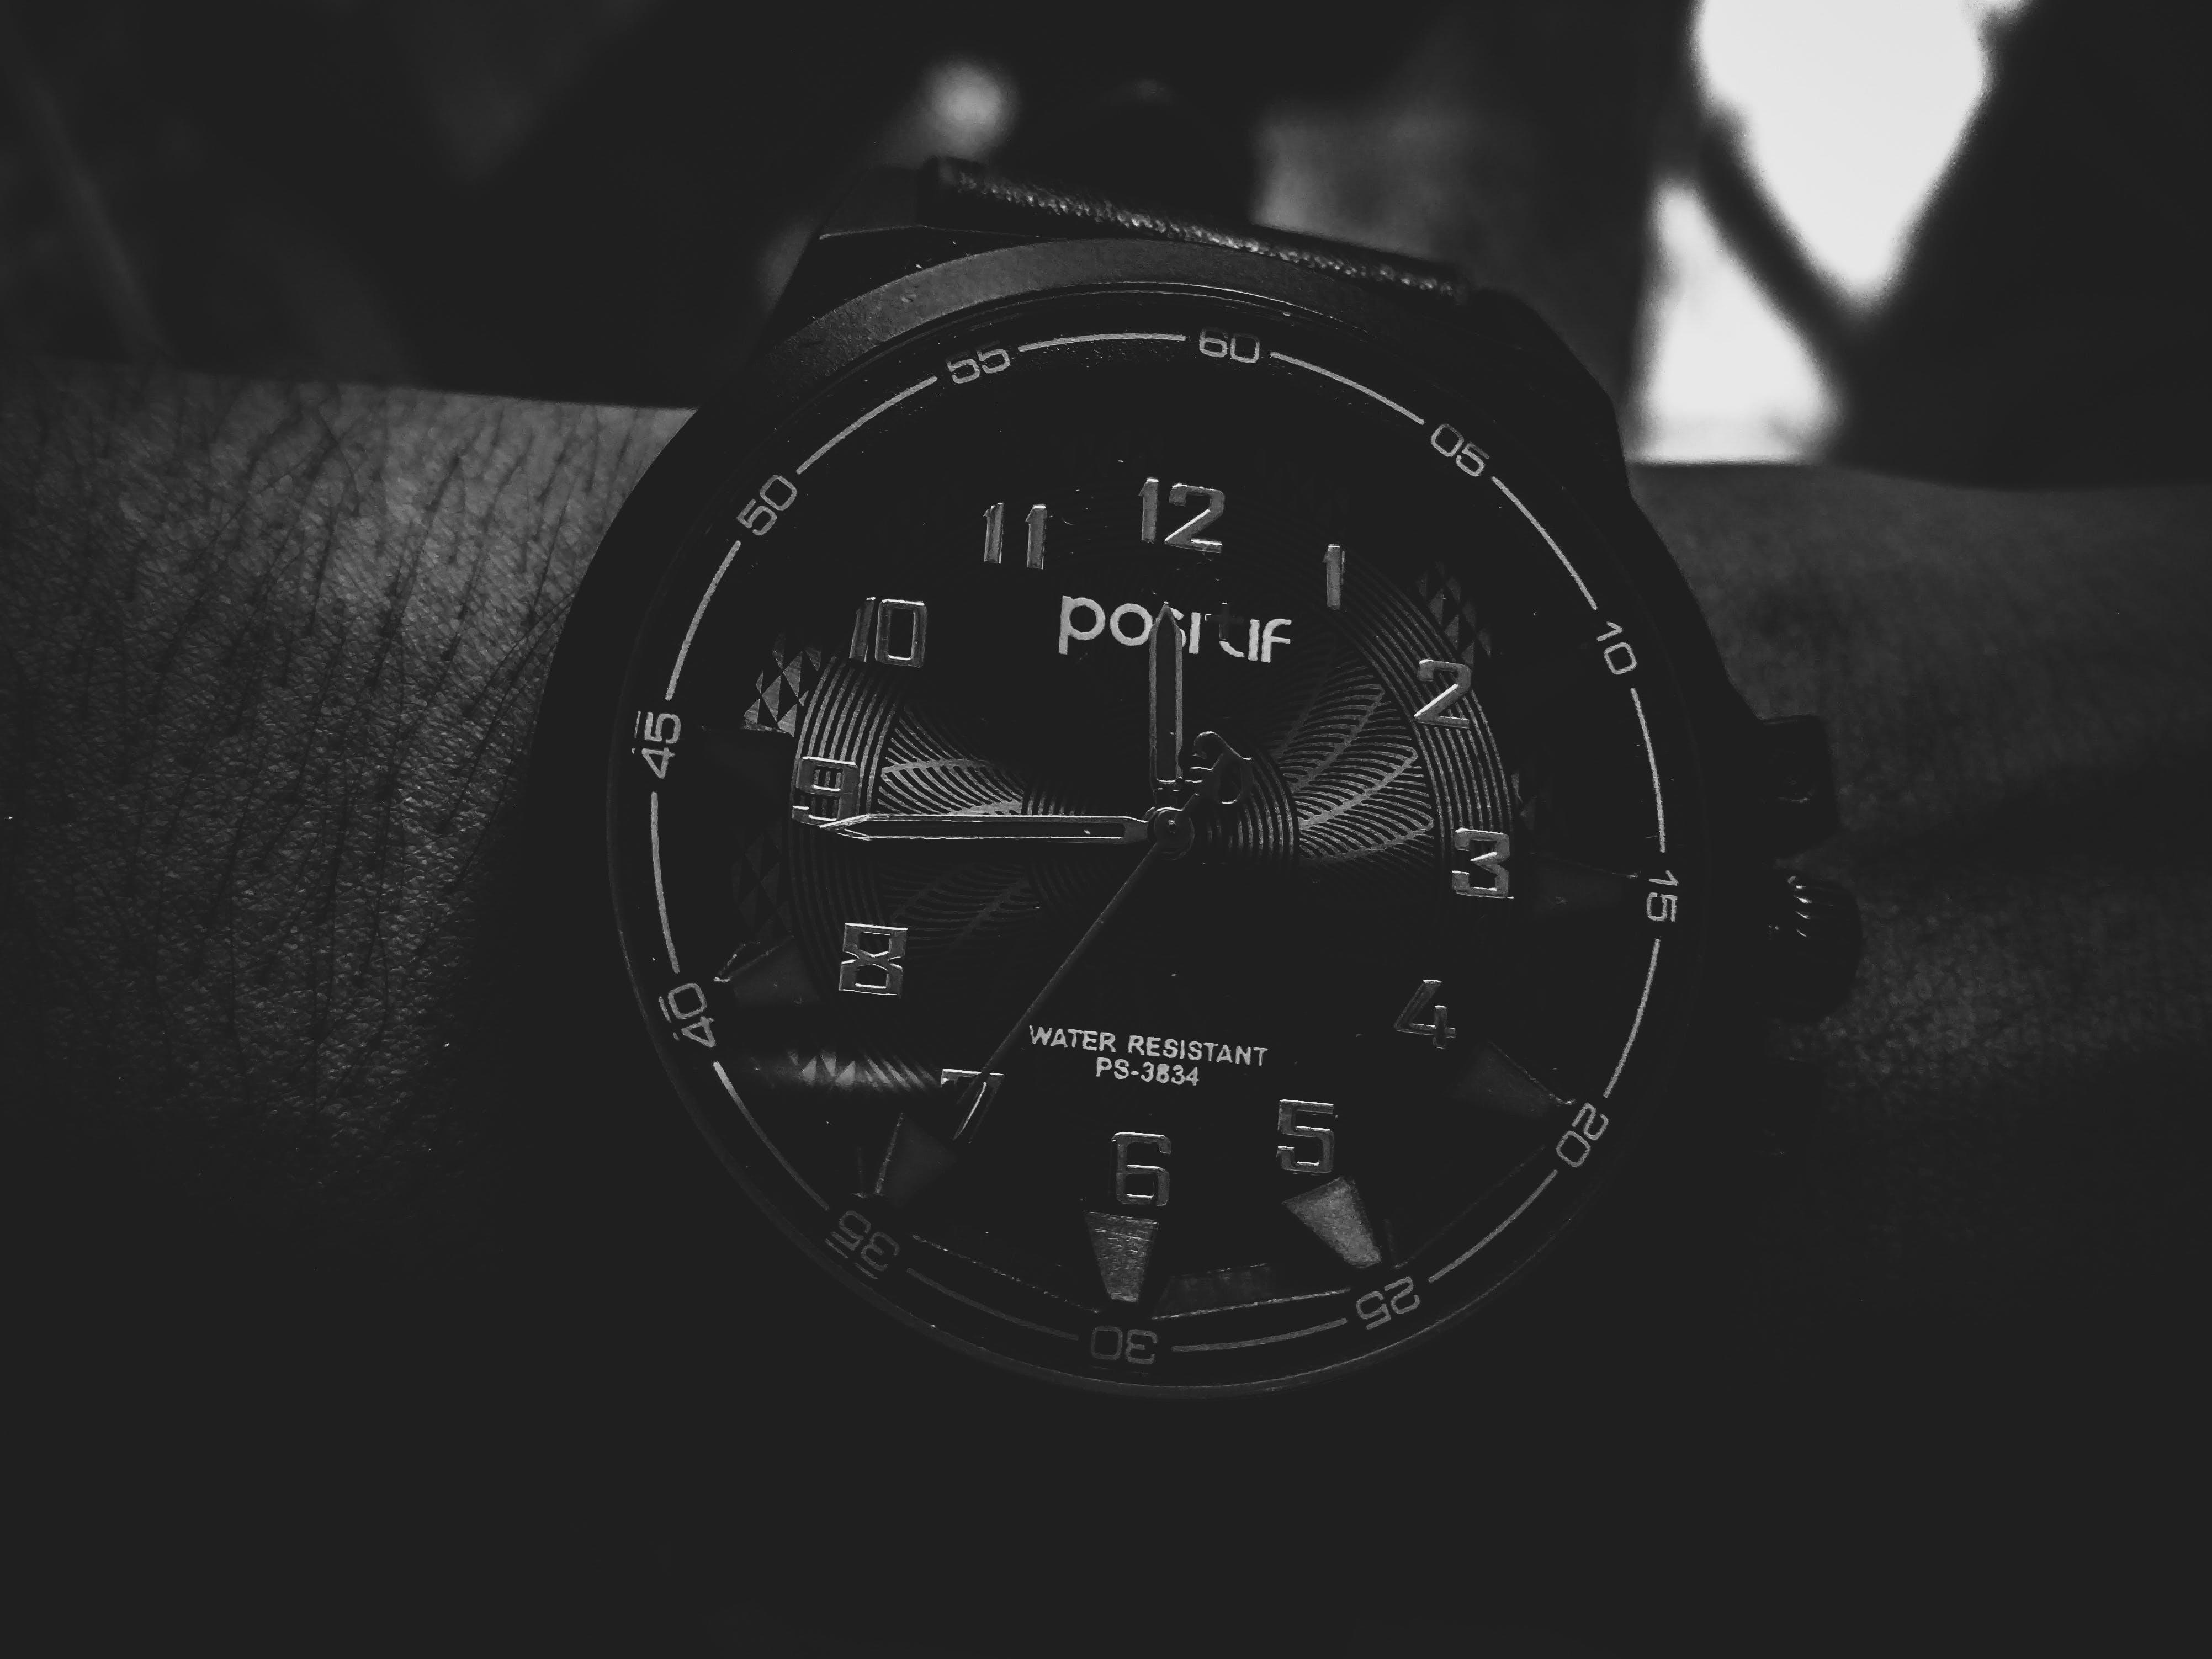 Analog Watch at 11:44